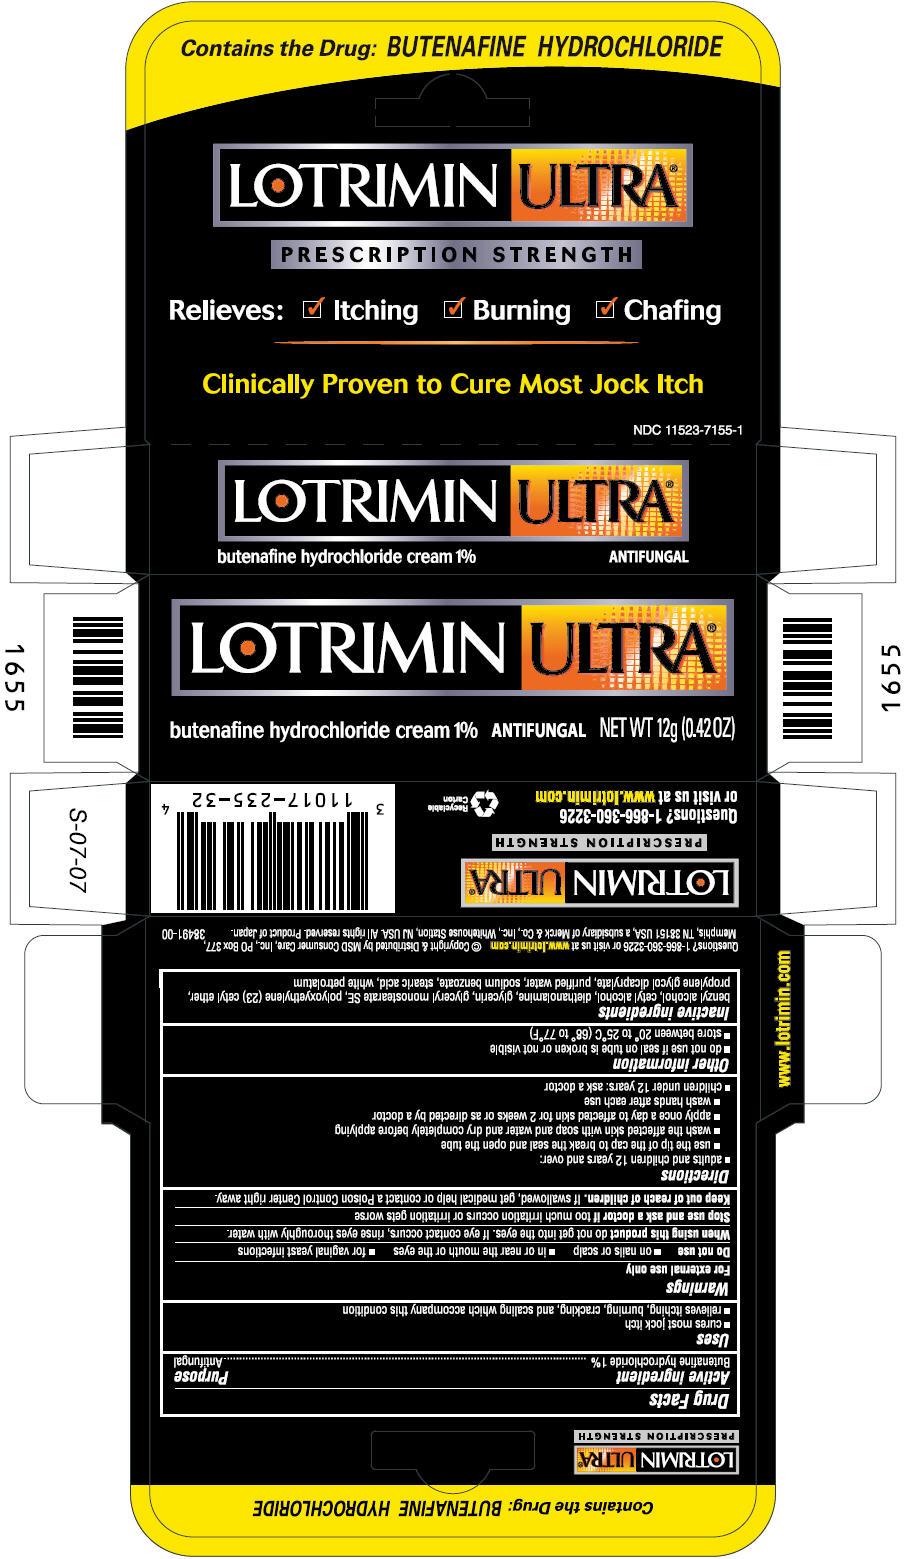 Lotrimin Ultra Jock Itch Antifungal (Butenafine Hydrochloride) Cream [Msd Consumer Care, Inc.]